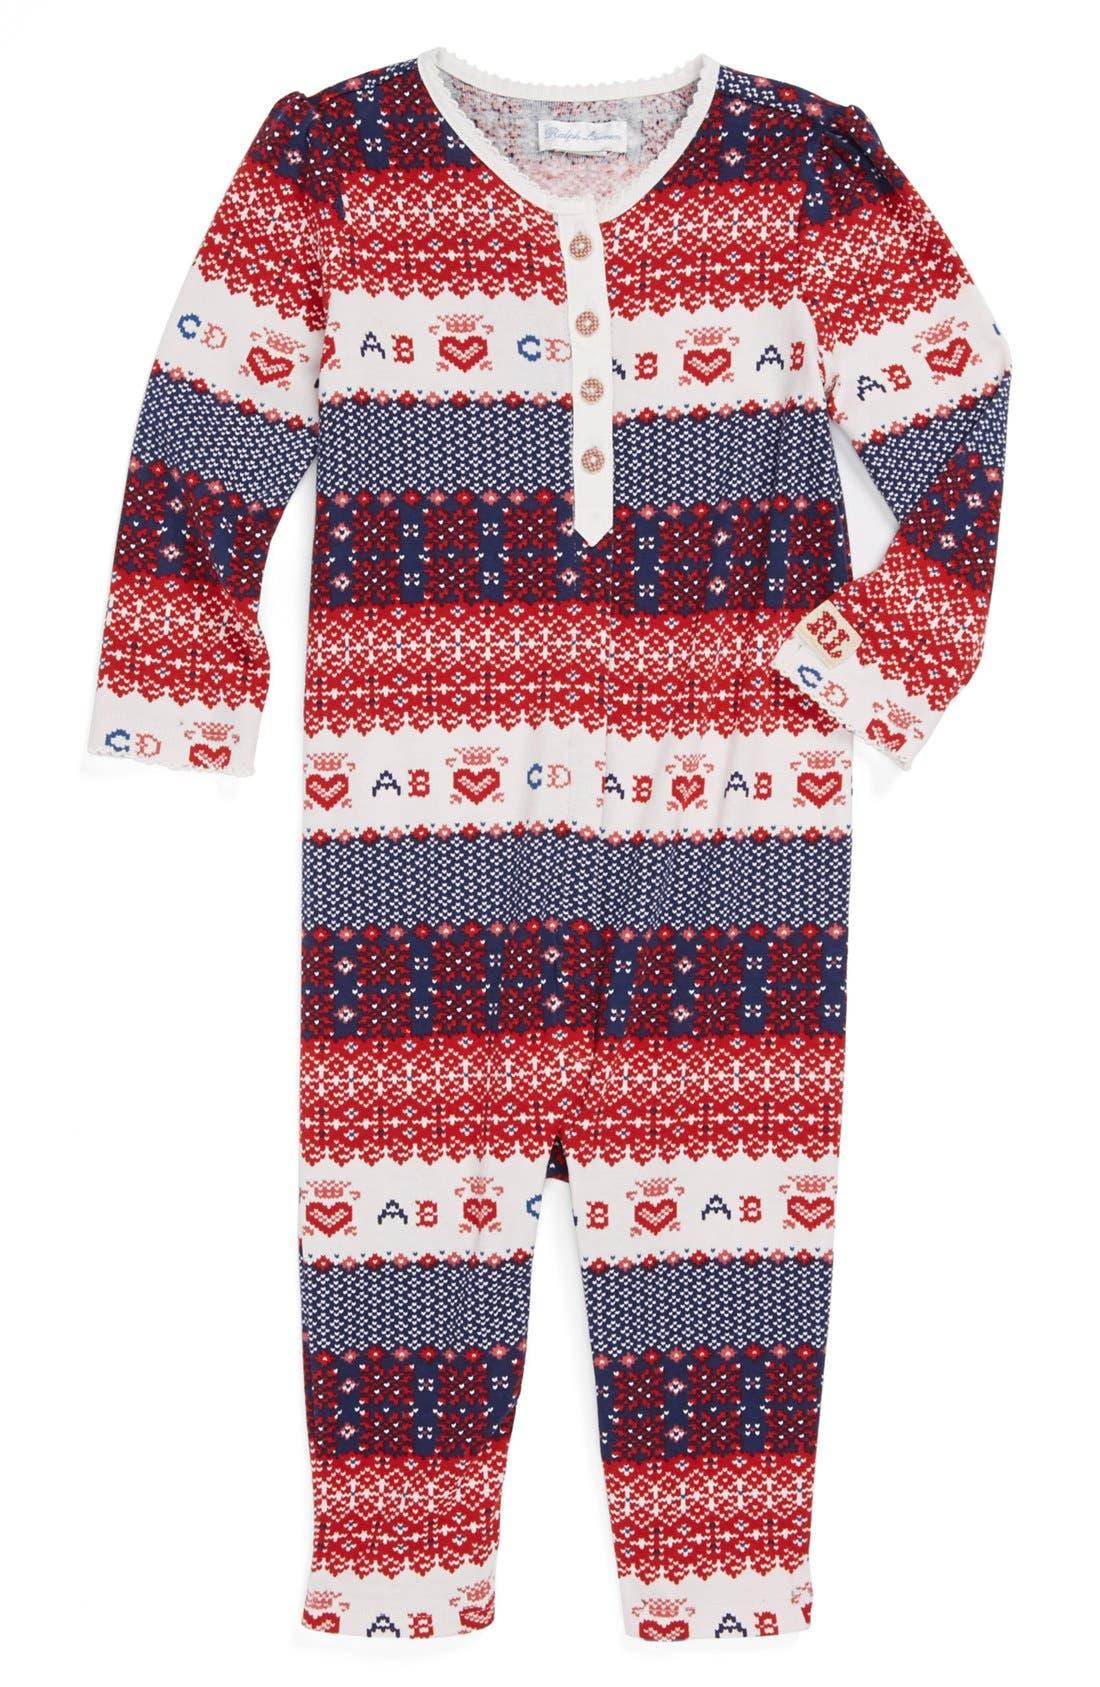 Alternate Image 1 Selected - Ralph Lauren Print Romper (Baby Girls)